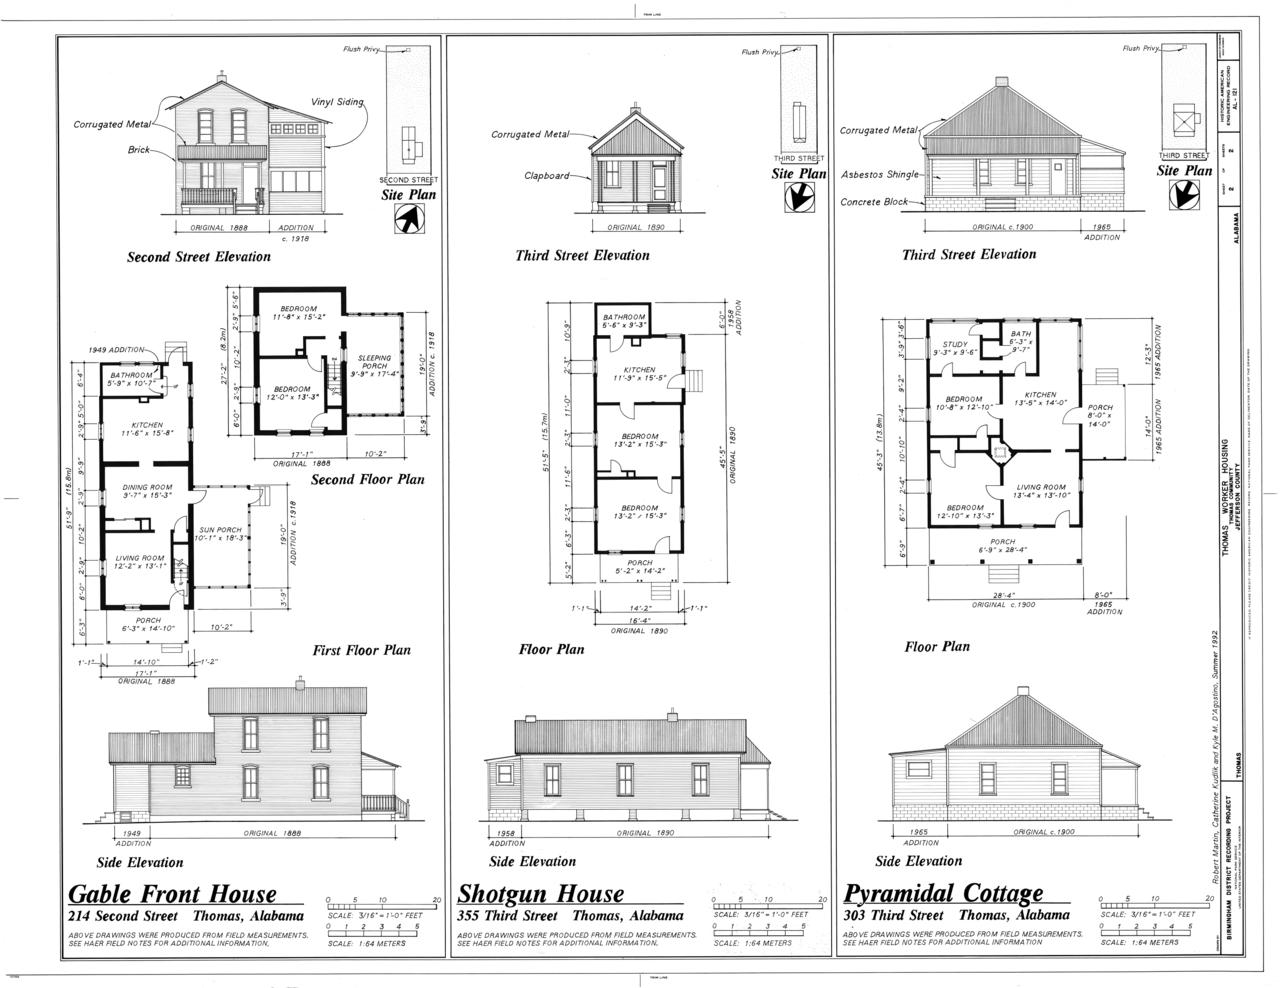 File Gable Front House Shotgun House And Pyramidal